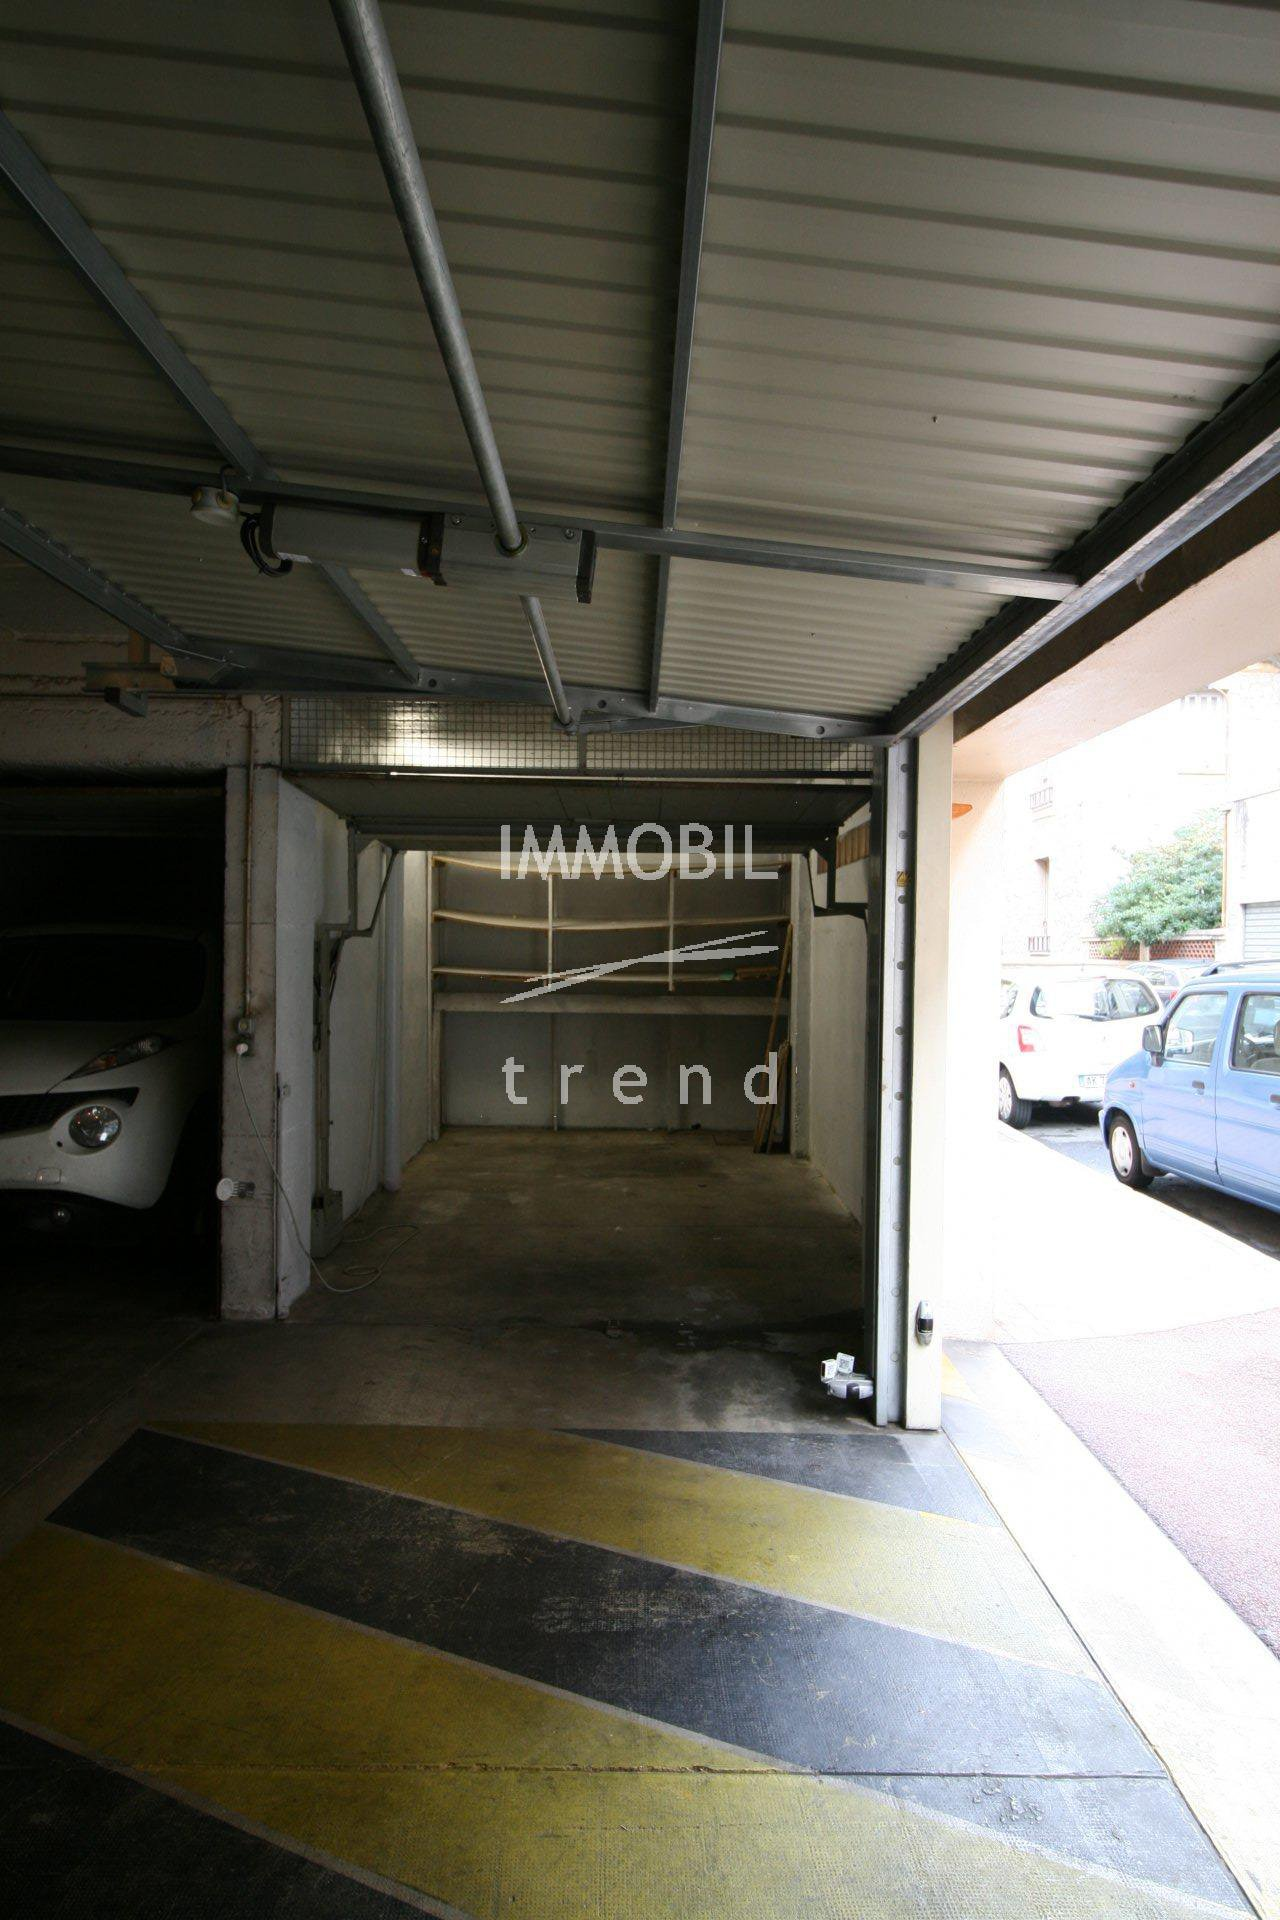 Immobilier menton a vendre garage centre ville for Garage a menton